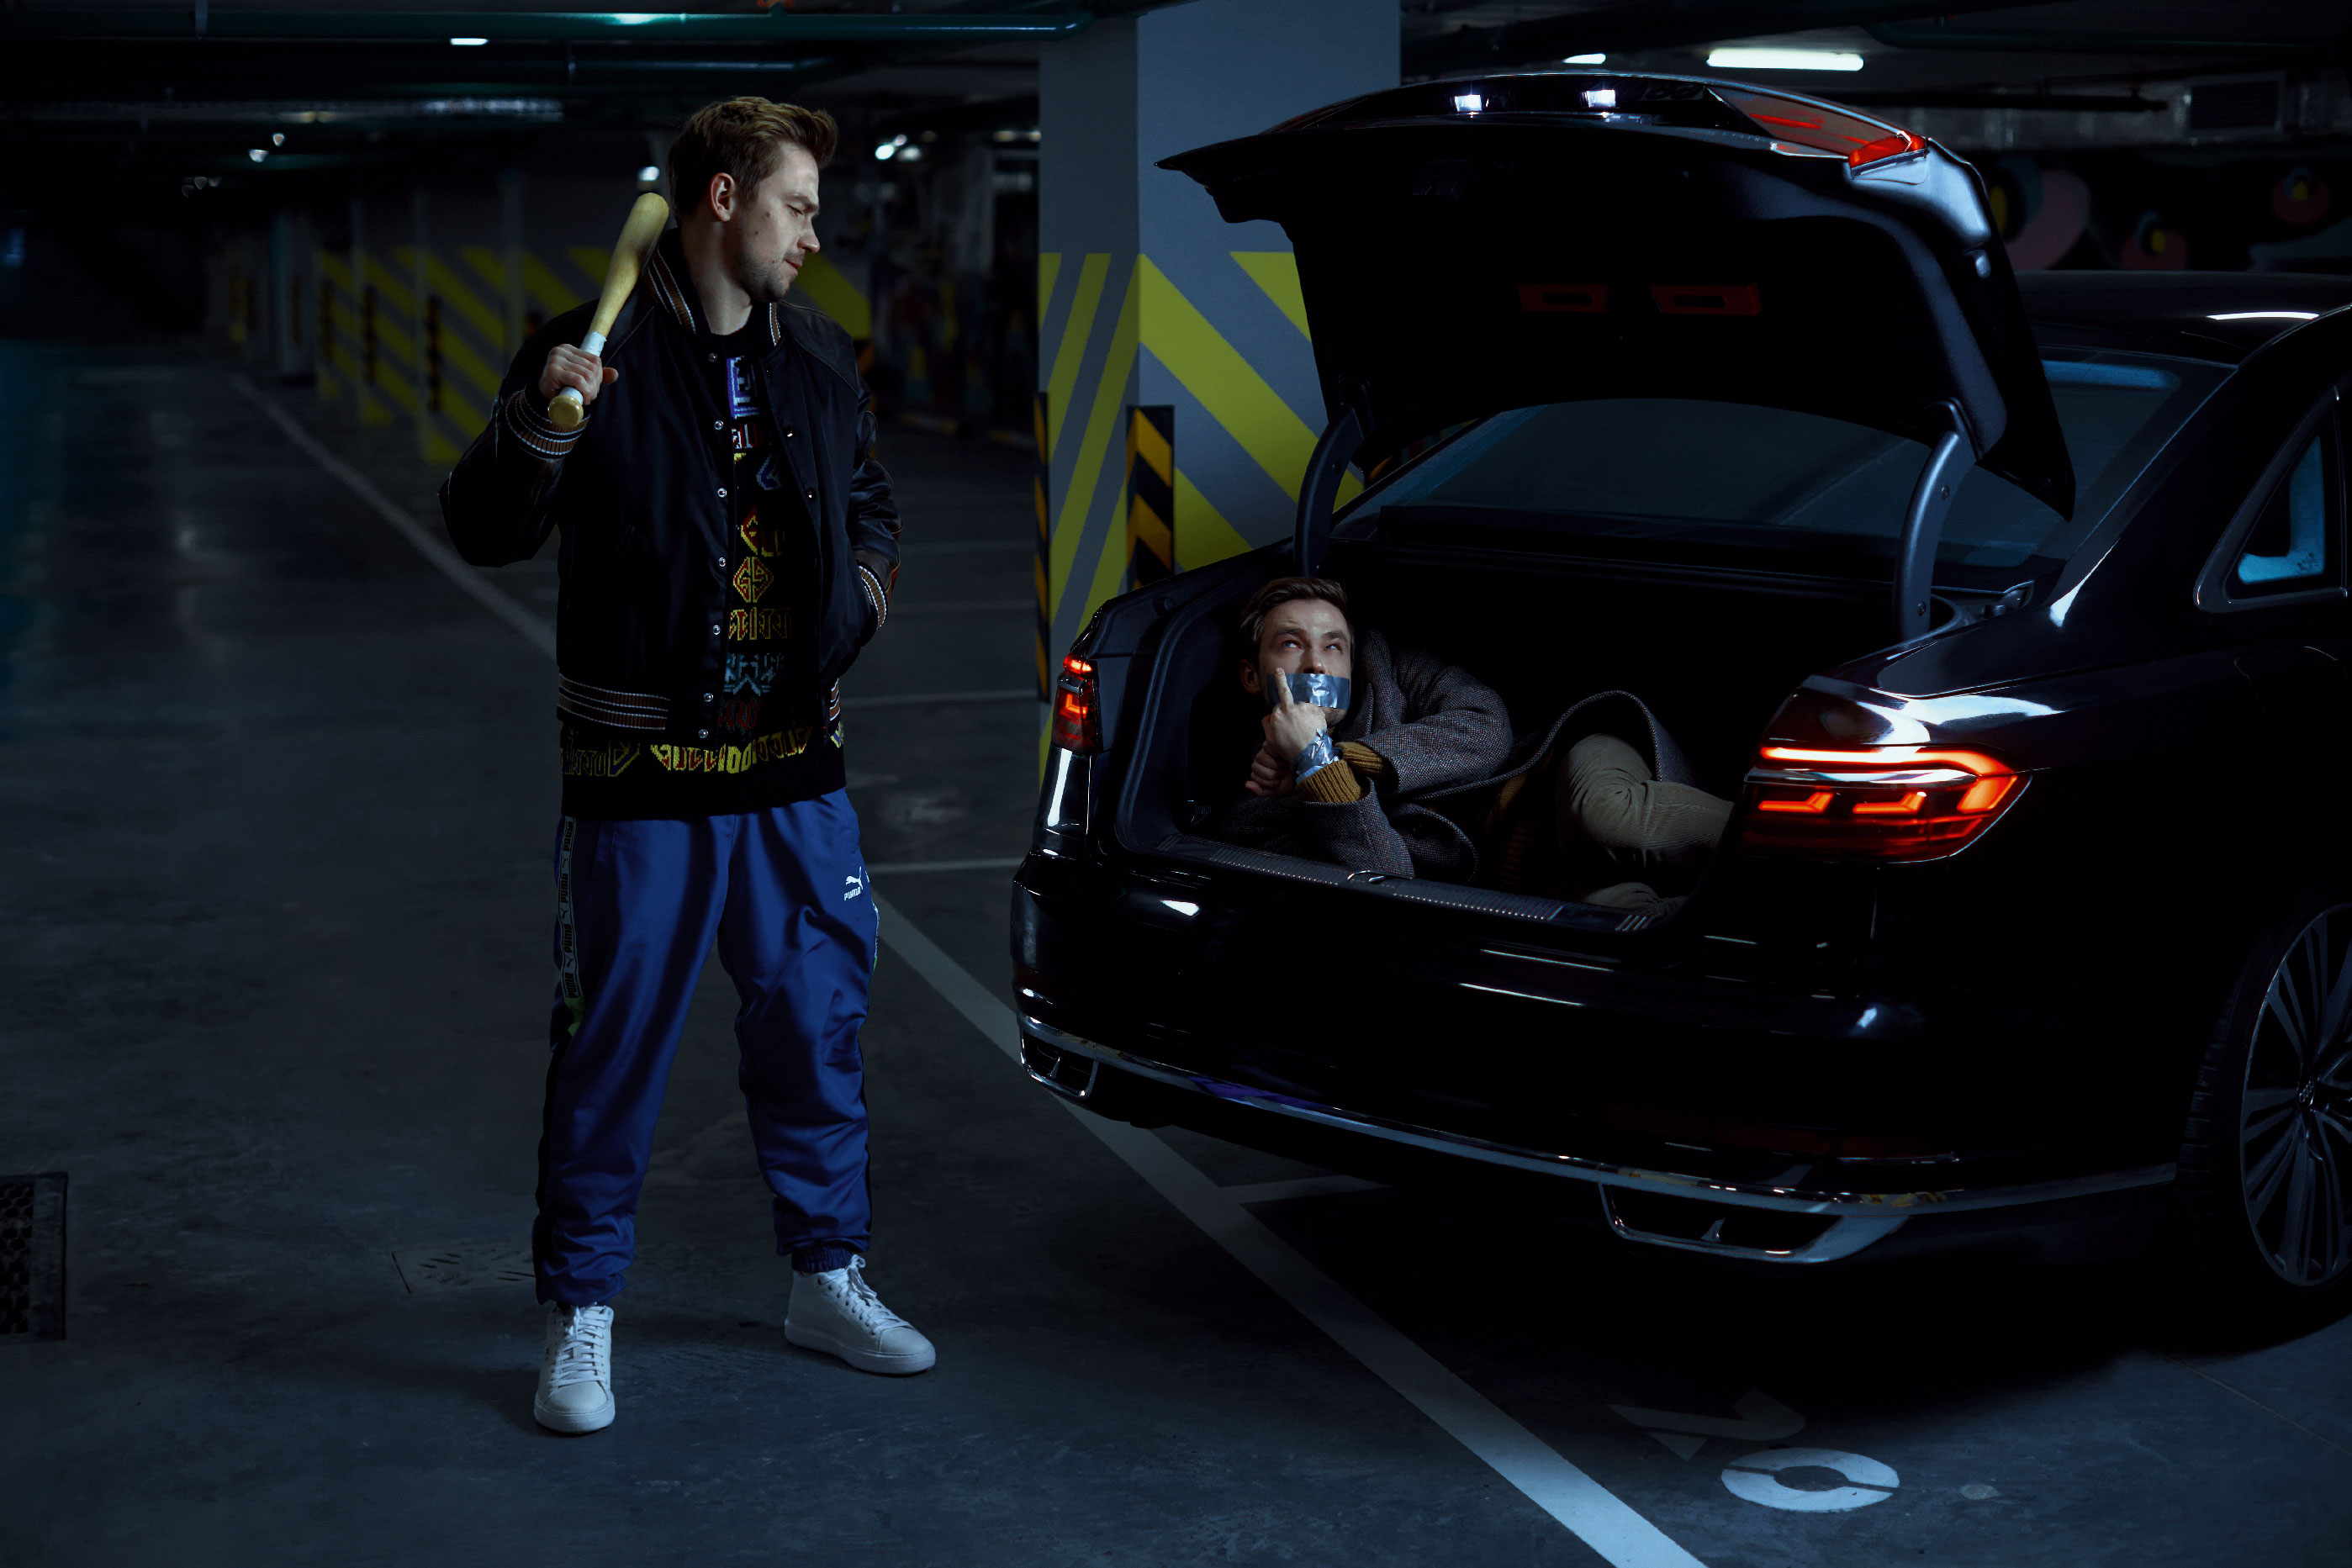 Слева: бомбер Prada, джемпер Gucci, брюки Puma,  кеды Geox. Справа: рубашка Calvin Klein Jeans, джемпер Louis Vuitton, пальто Gucci, брюки Paul Smith